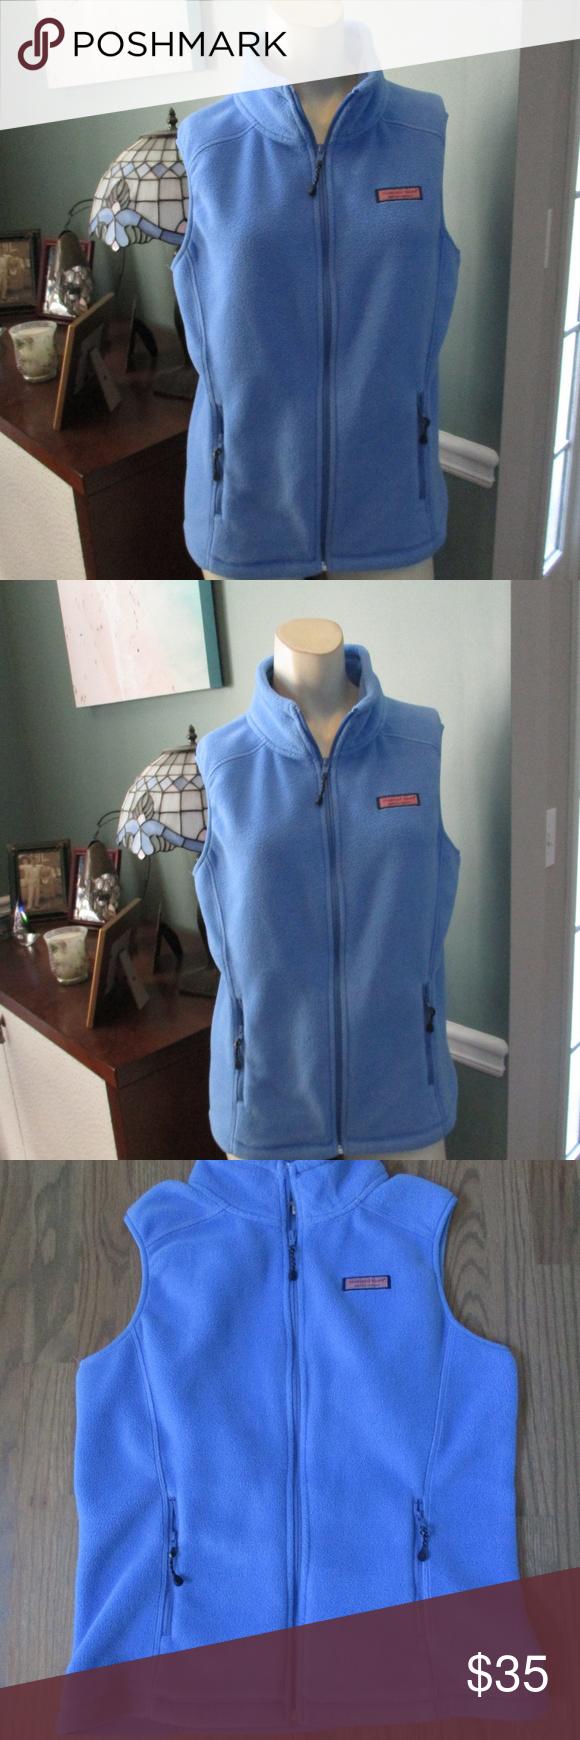 Vineyard vines blue fleece womenus vest small my posh closet